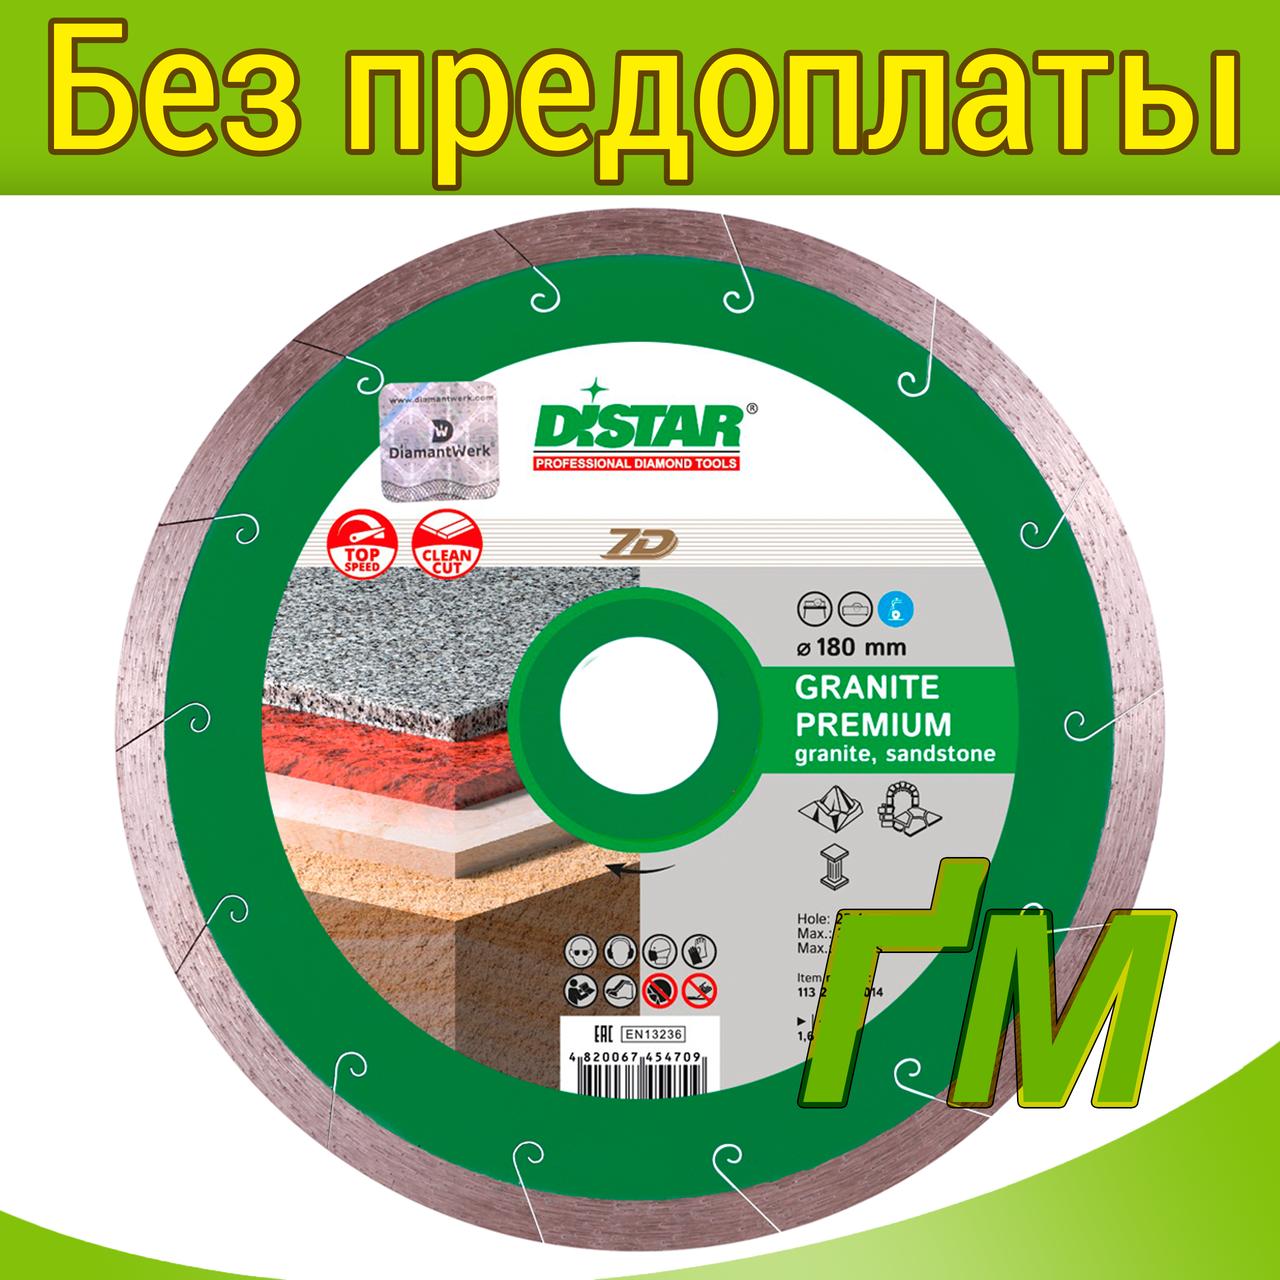 Алмазные диски для станков Distar Granite Premium 1A1R 125x1,5x8x22,23